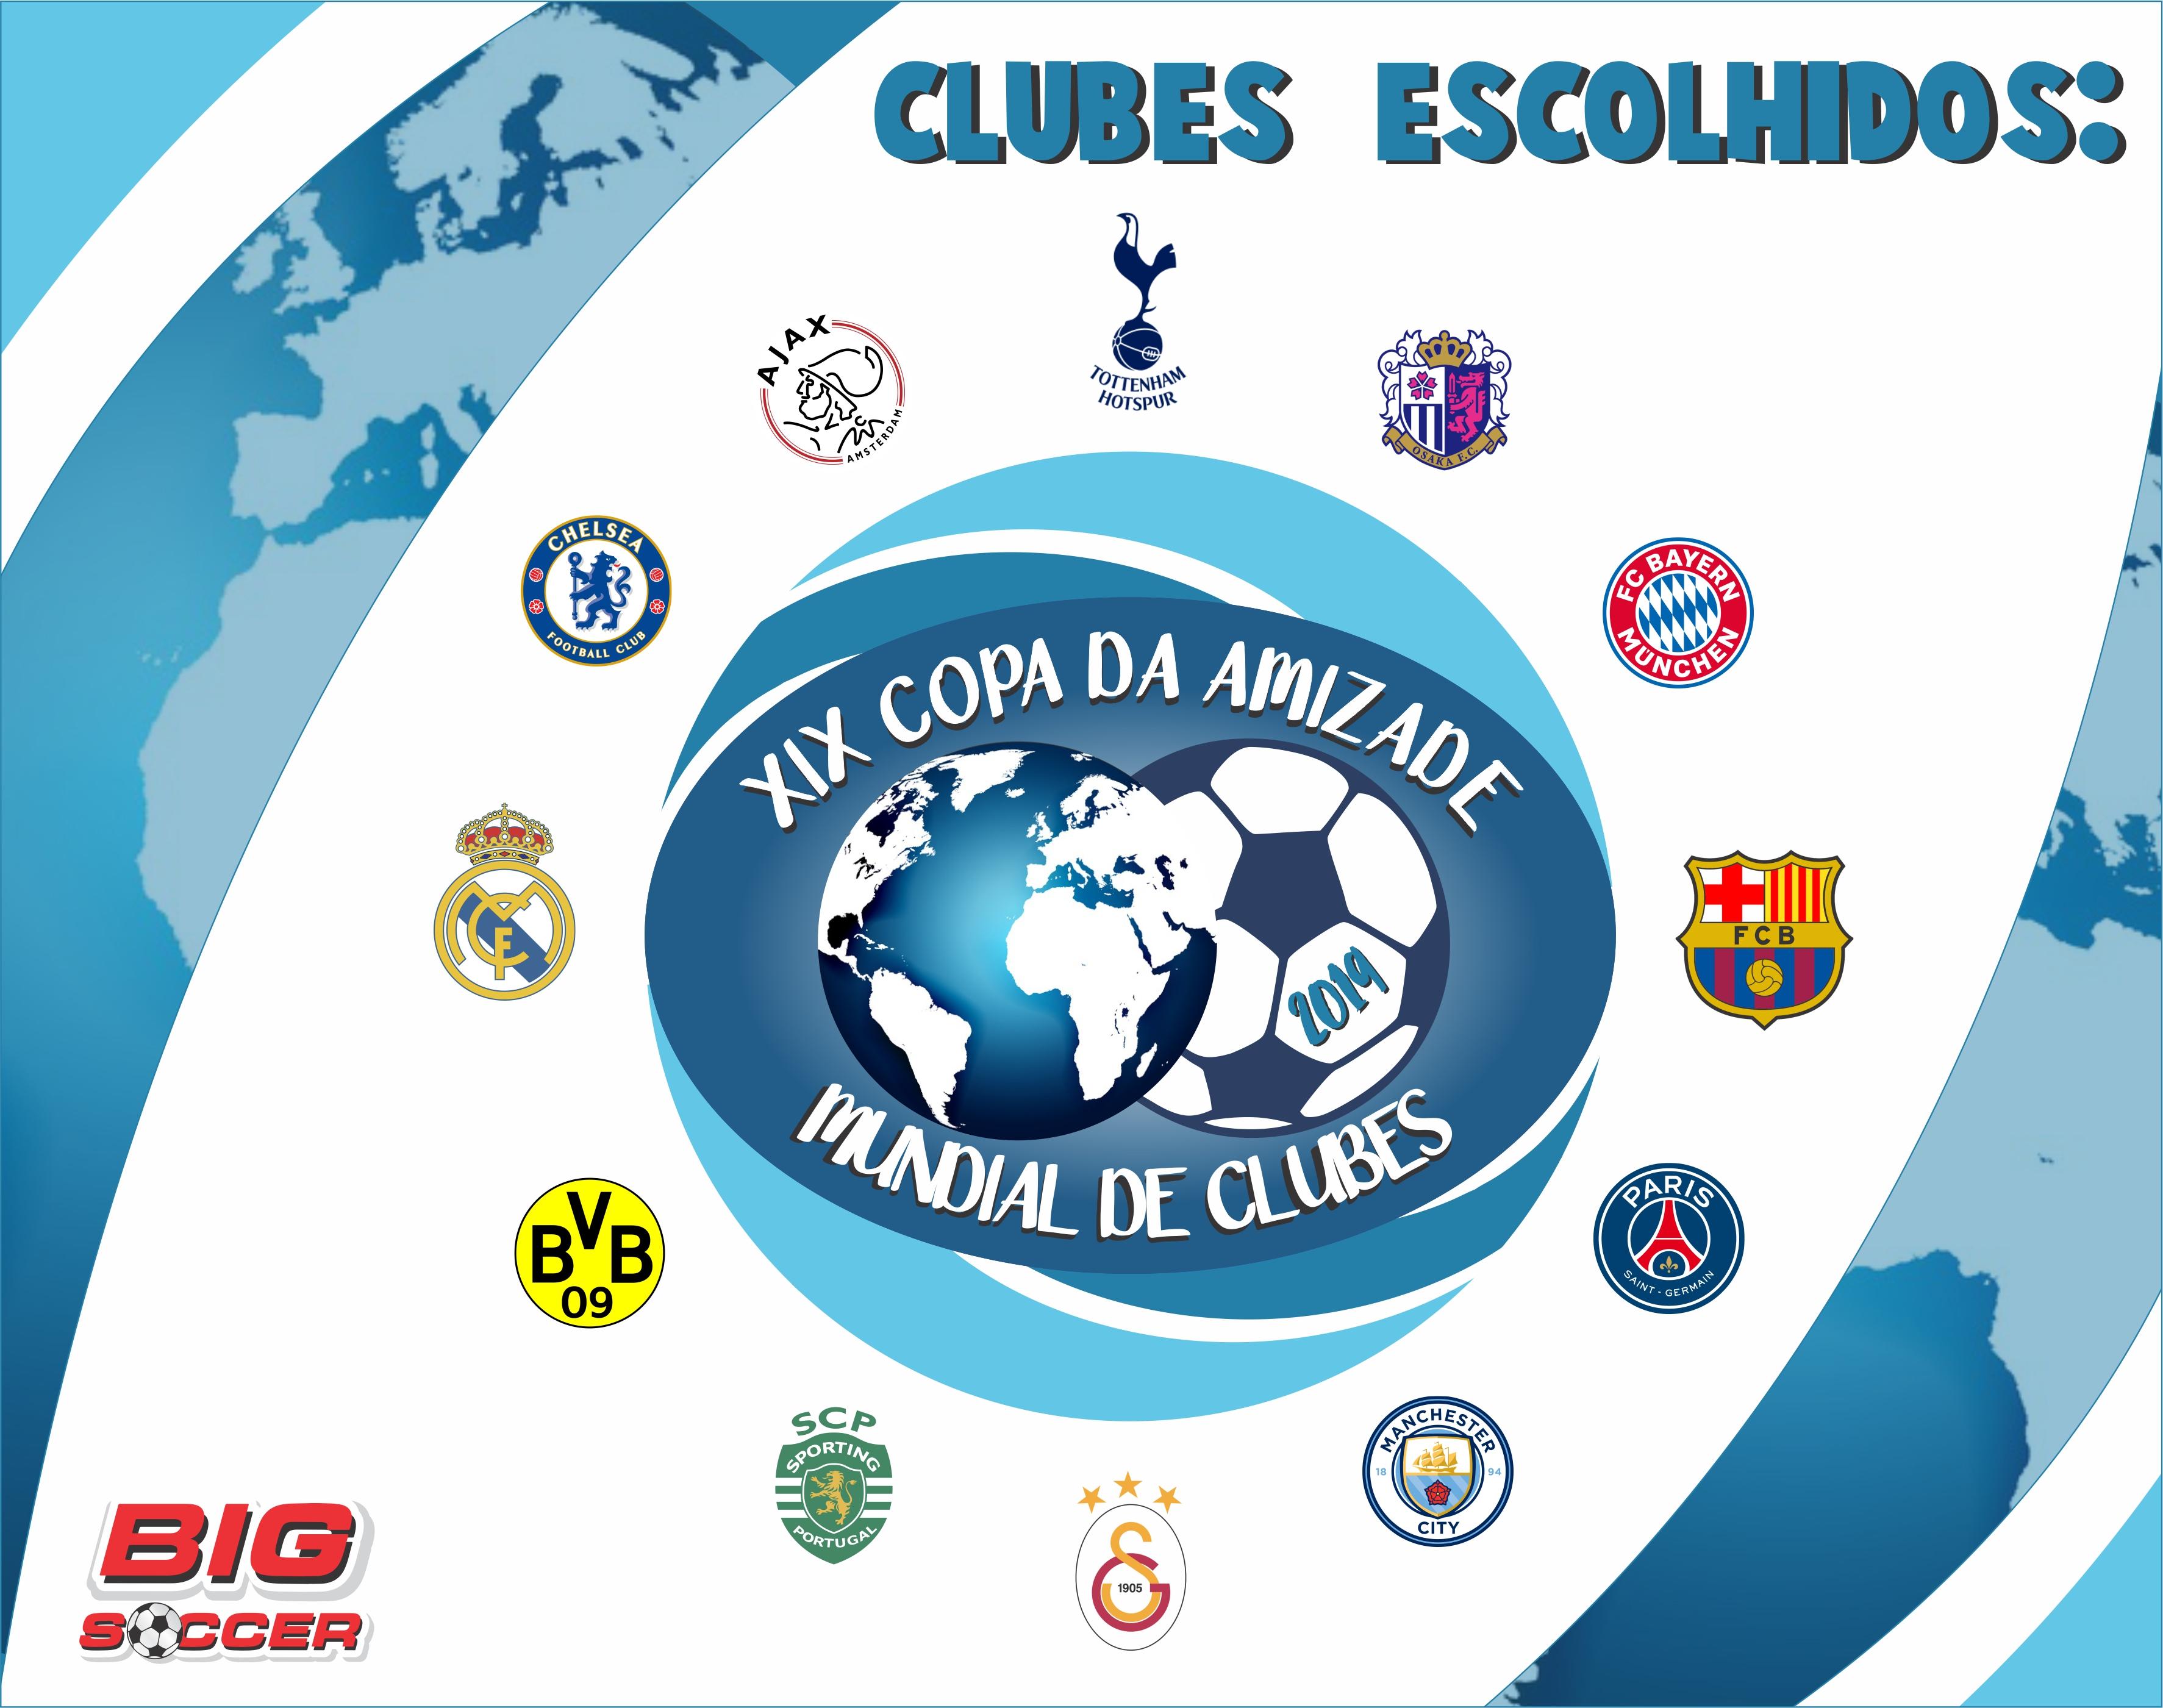 CLUBES ESCOLHIDOS - XIX COPA DA AMIZADE - MUNDIAL DE CLUBES